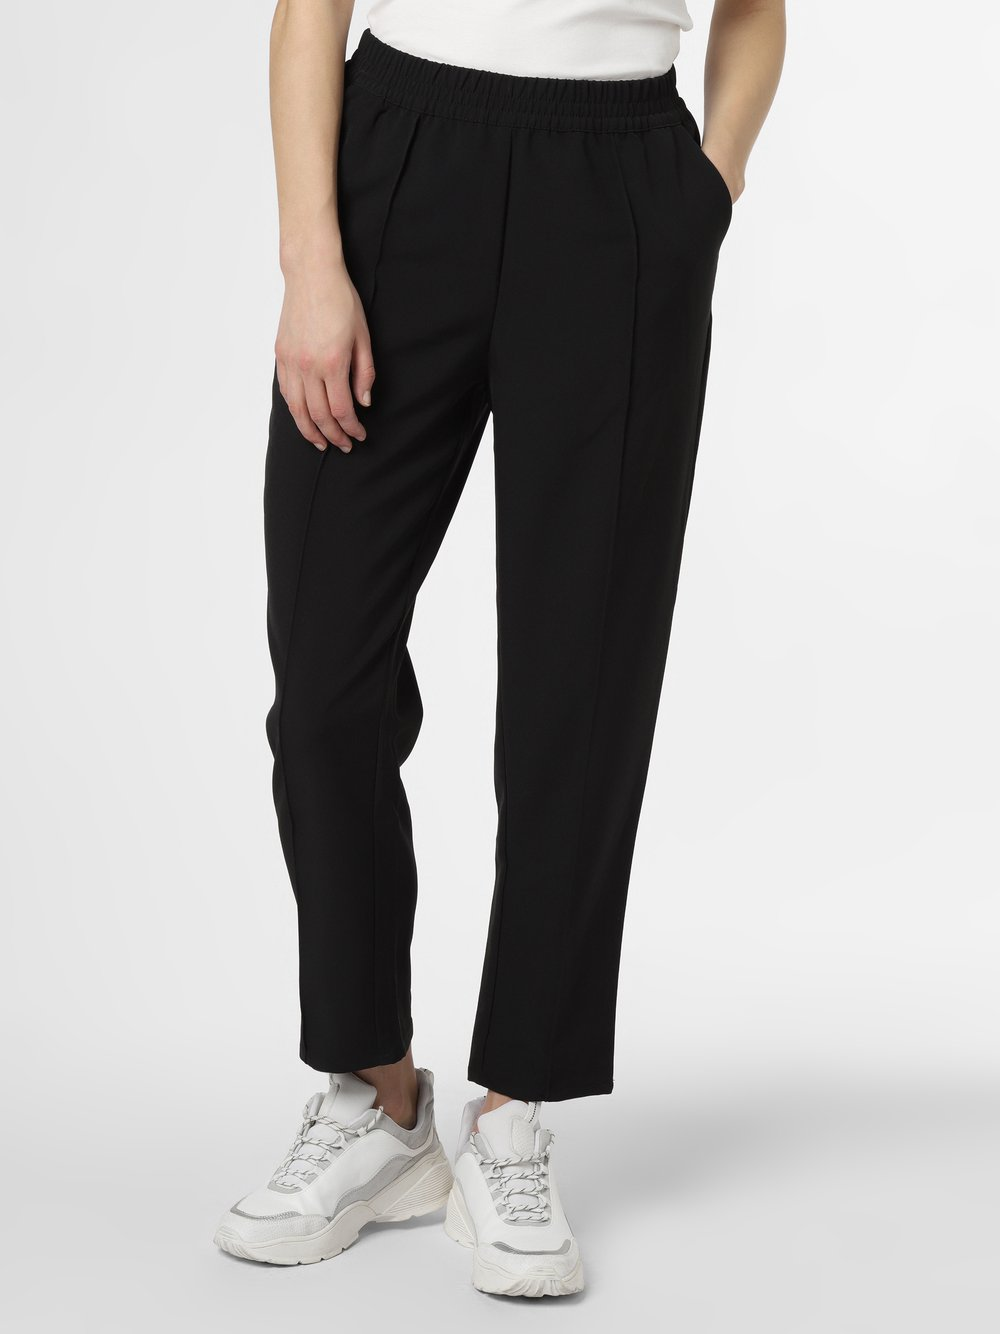 Aygill's - Spodnie damskie, czarny